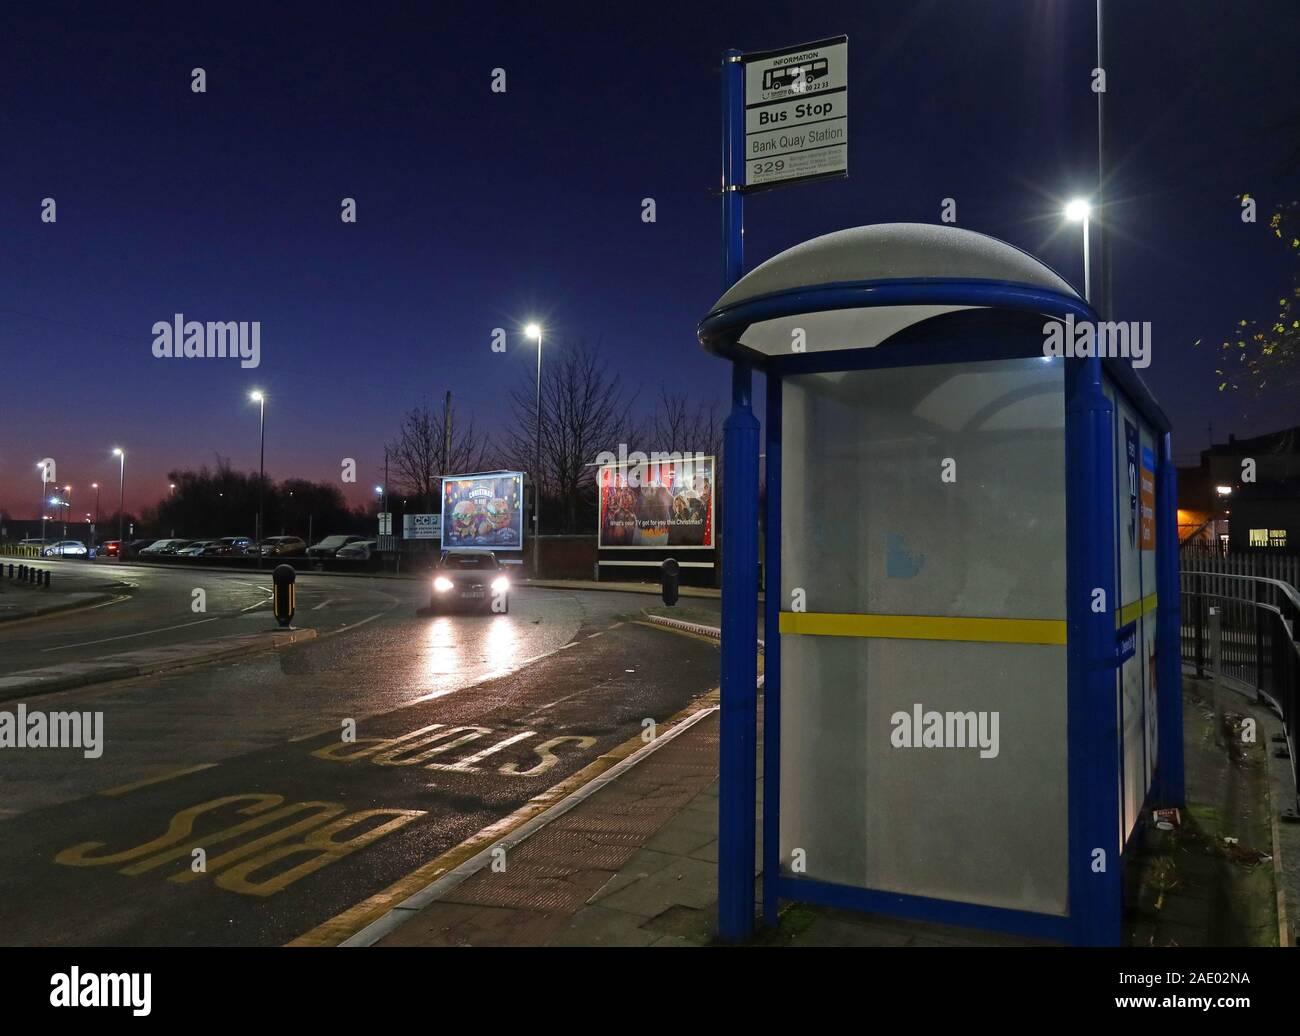 @Hotpixuk,HotpixUK,GoTonySmith,UK,England,dusk,Cheshire,railway,rail,night,winter,road